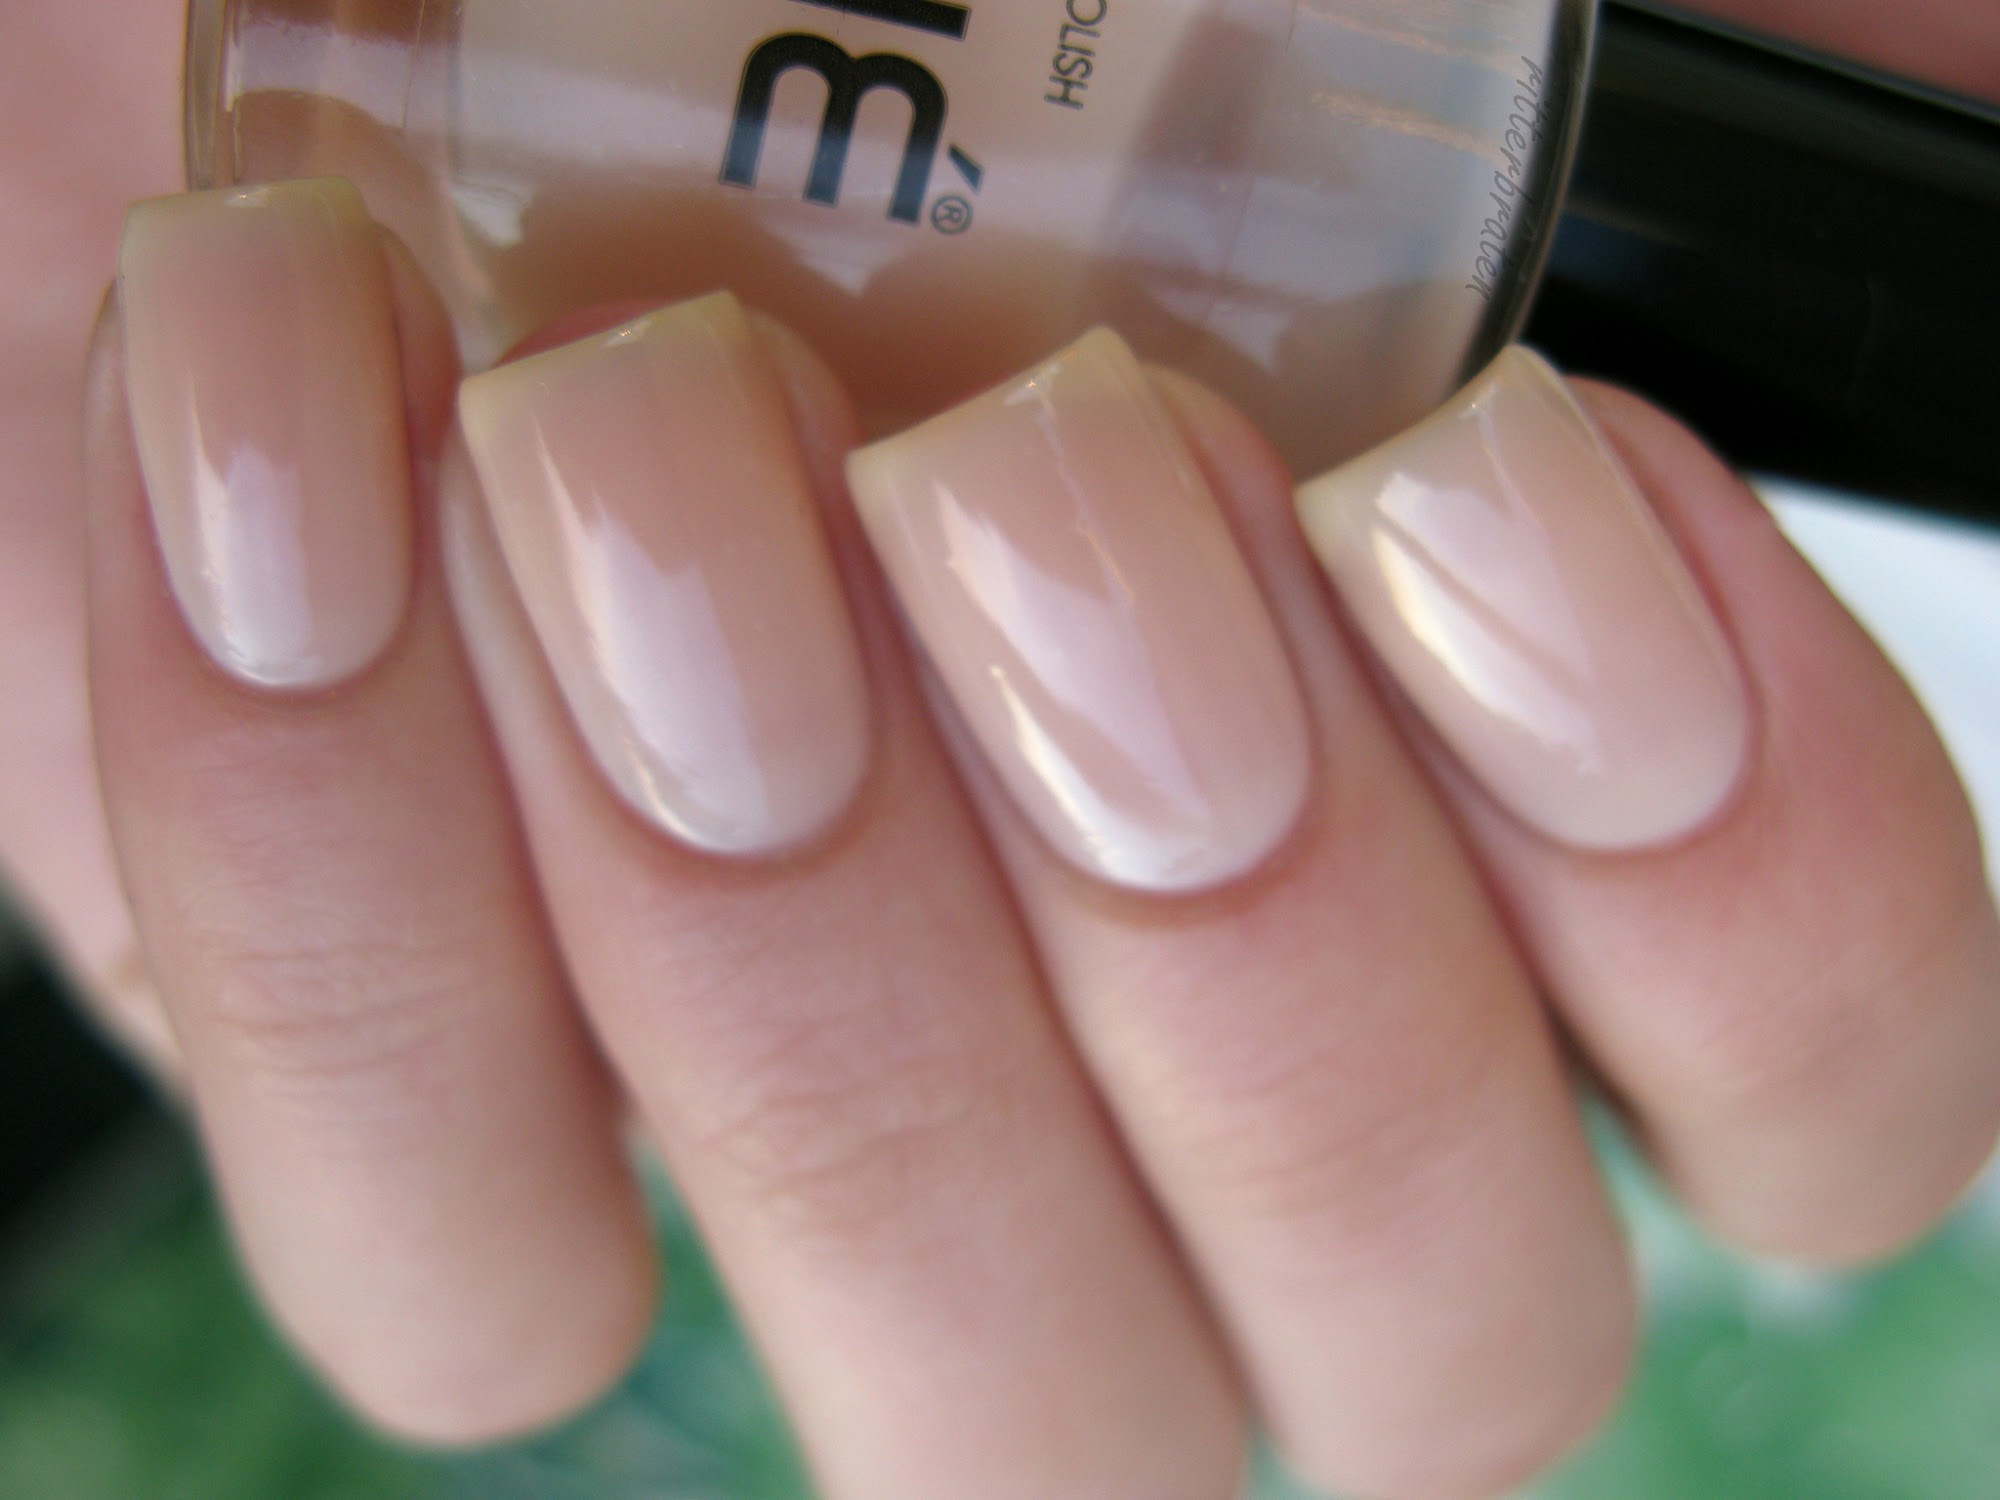 Cliché Areia nail polish